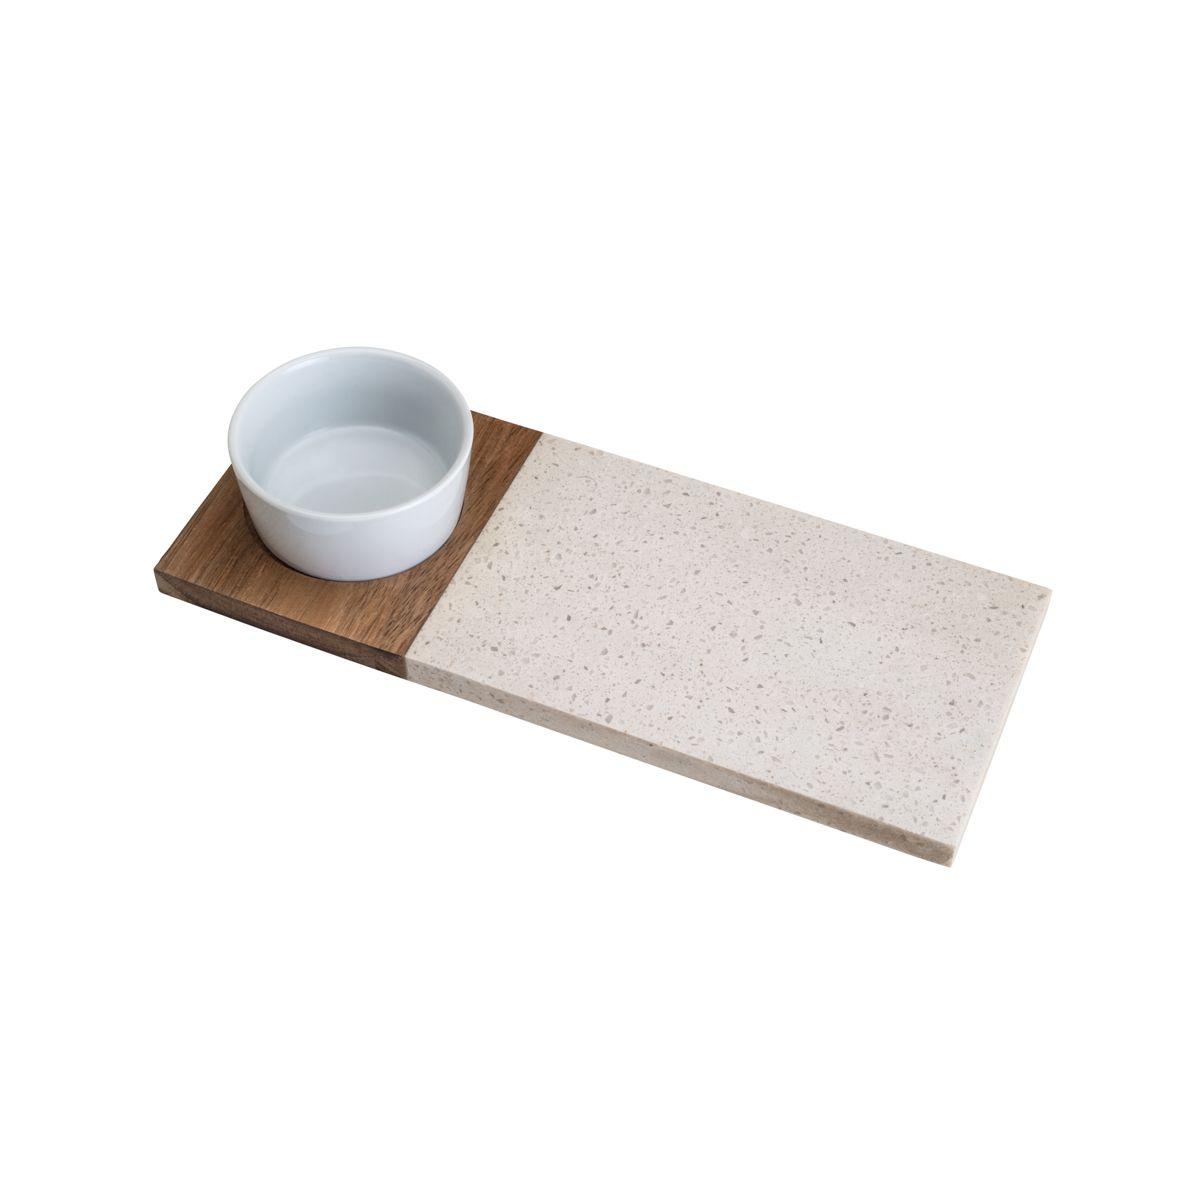 Conjunto de Bandeja de Bambu com Bowl